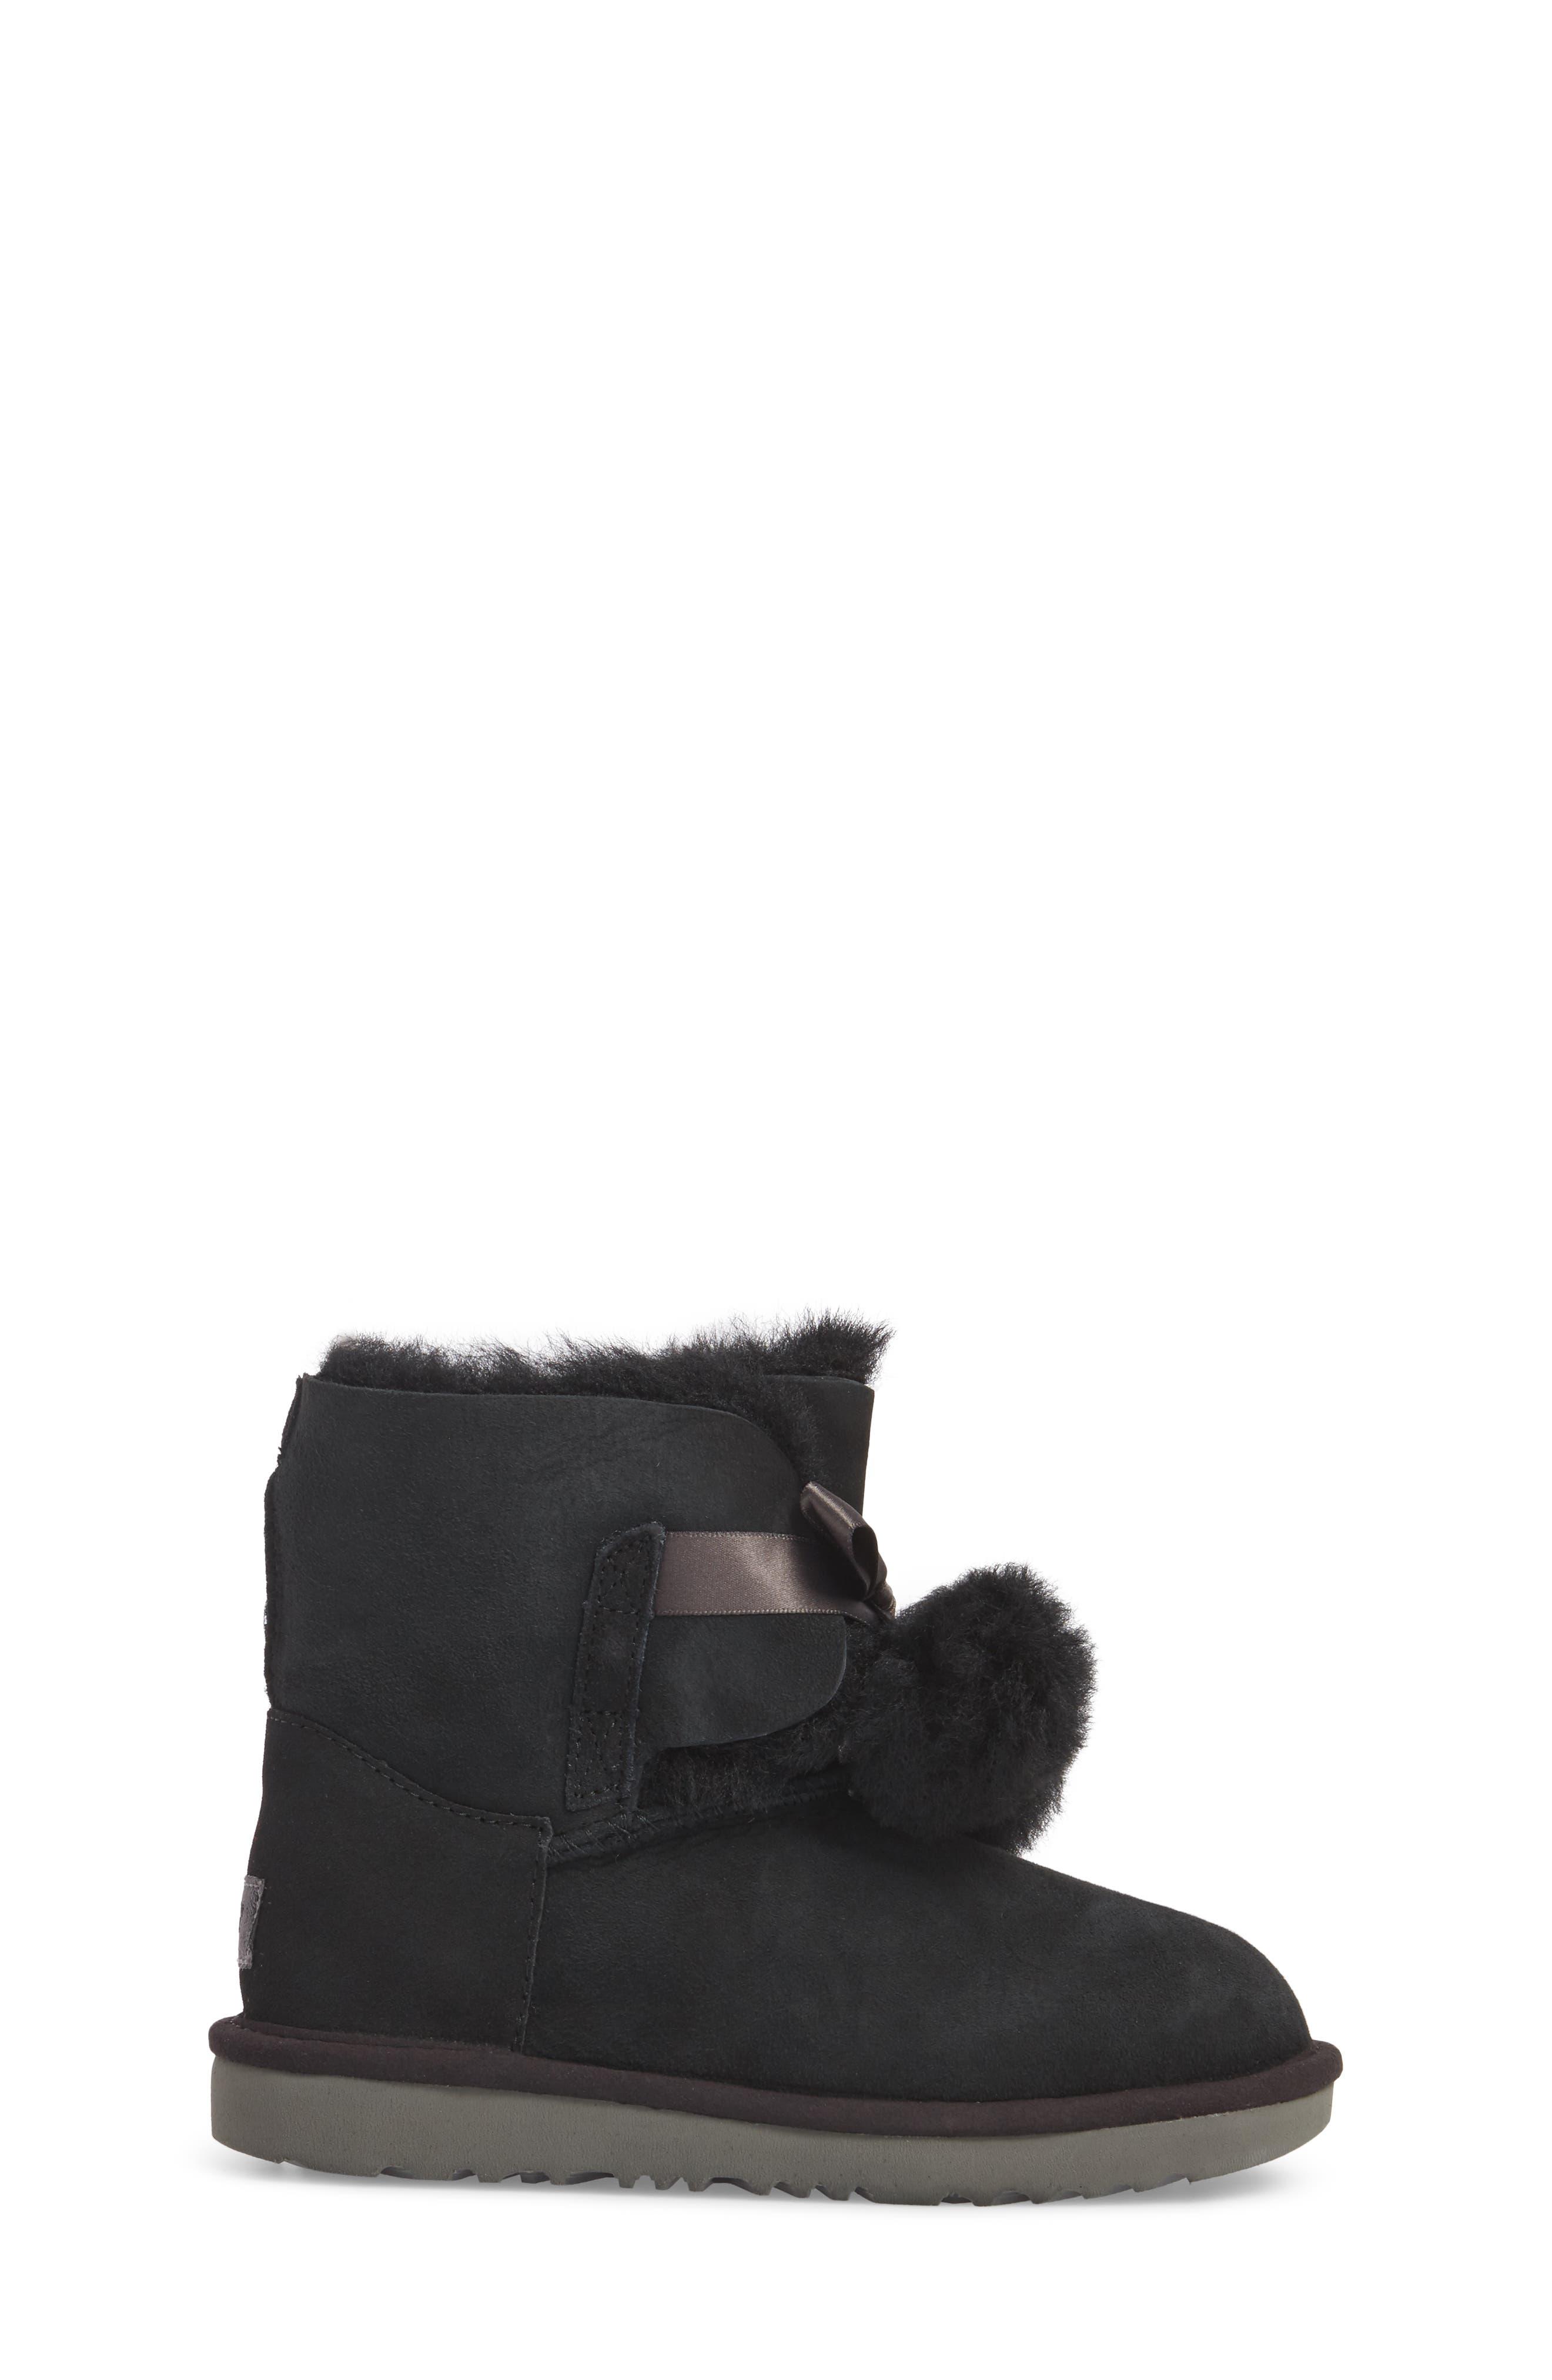 Gita Water-Resistant Genuine Shearling Pom Bootie,                             Alternate thumbnail 3, color,                             Black